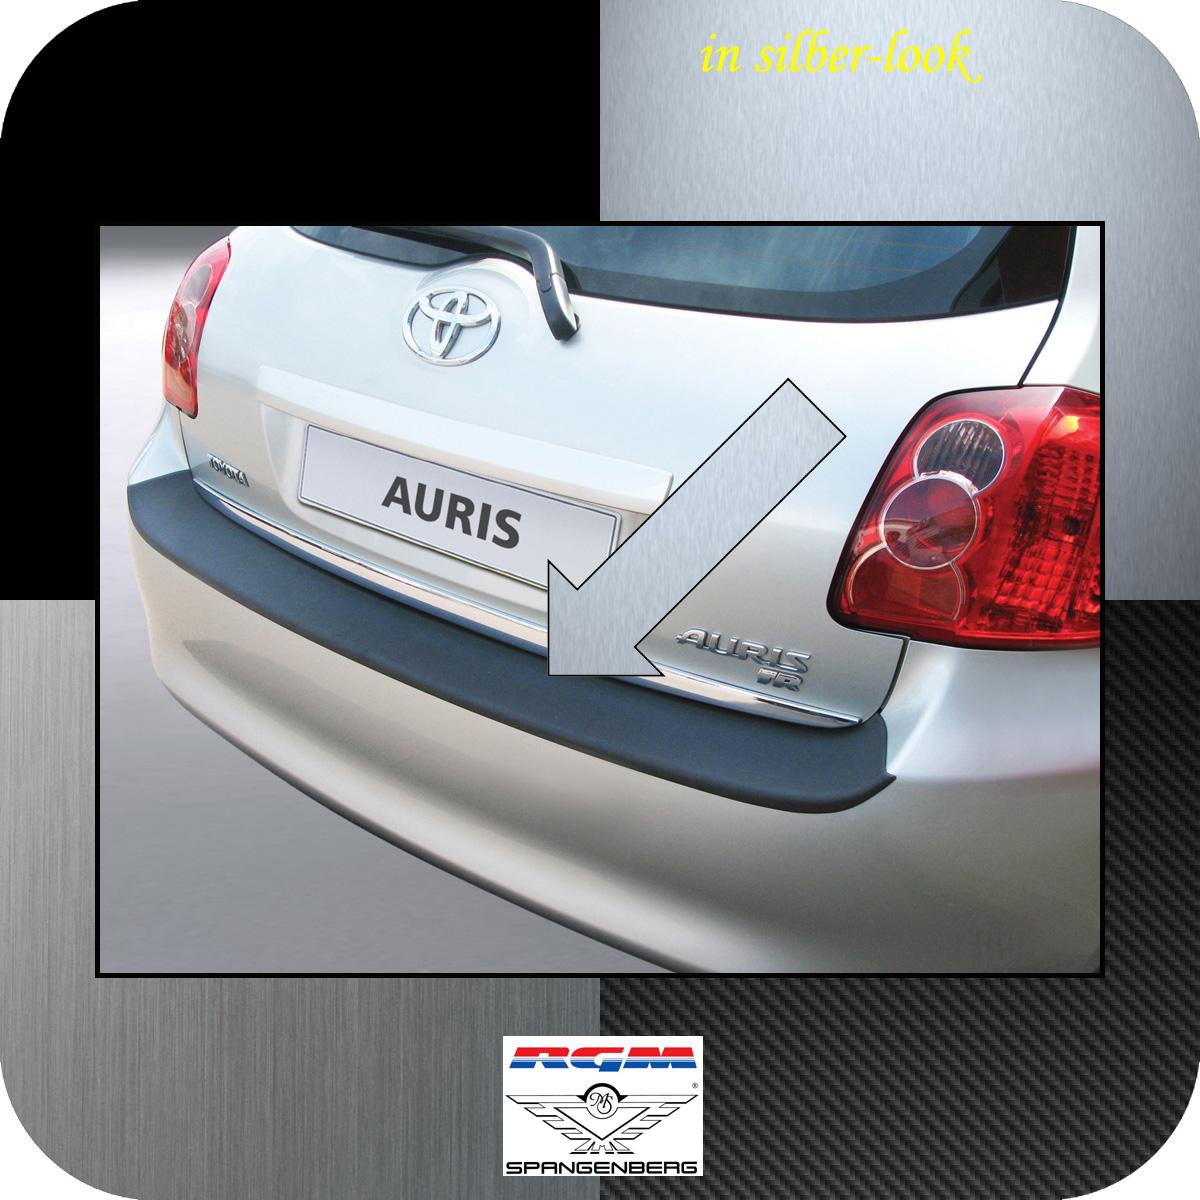 Ladekantenschutz Silber-Look Toyota Auris I Schrägheck vor Mopf 2006-10 3506264